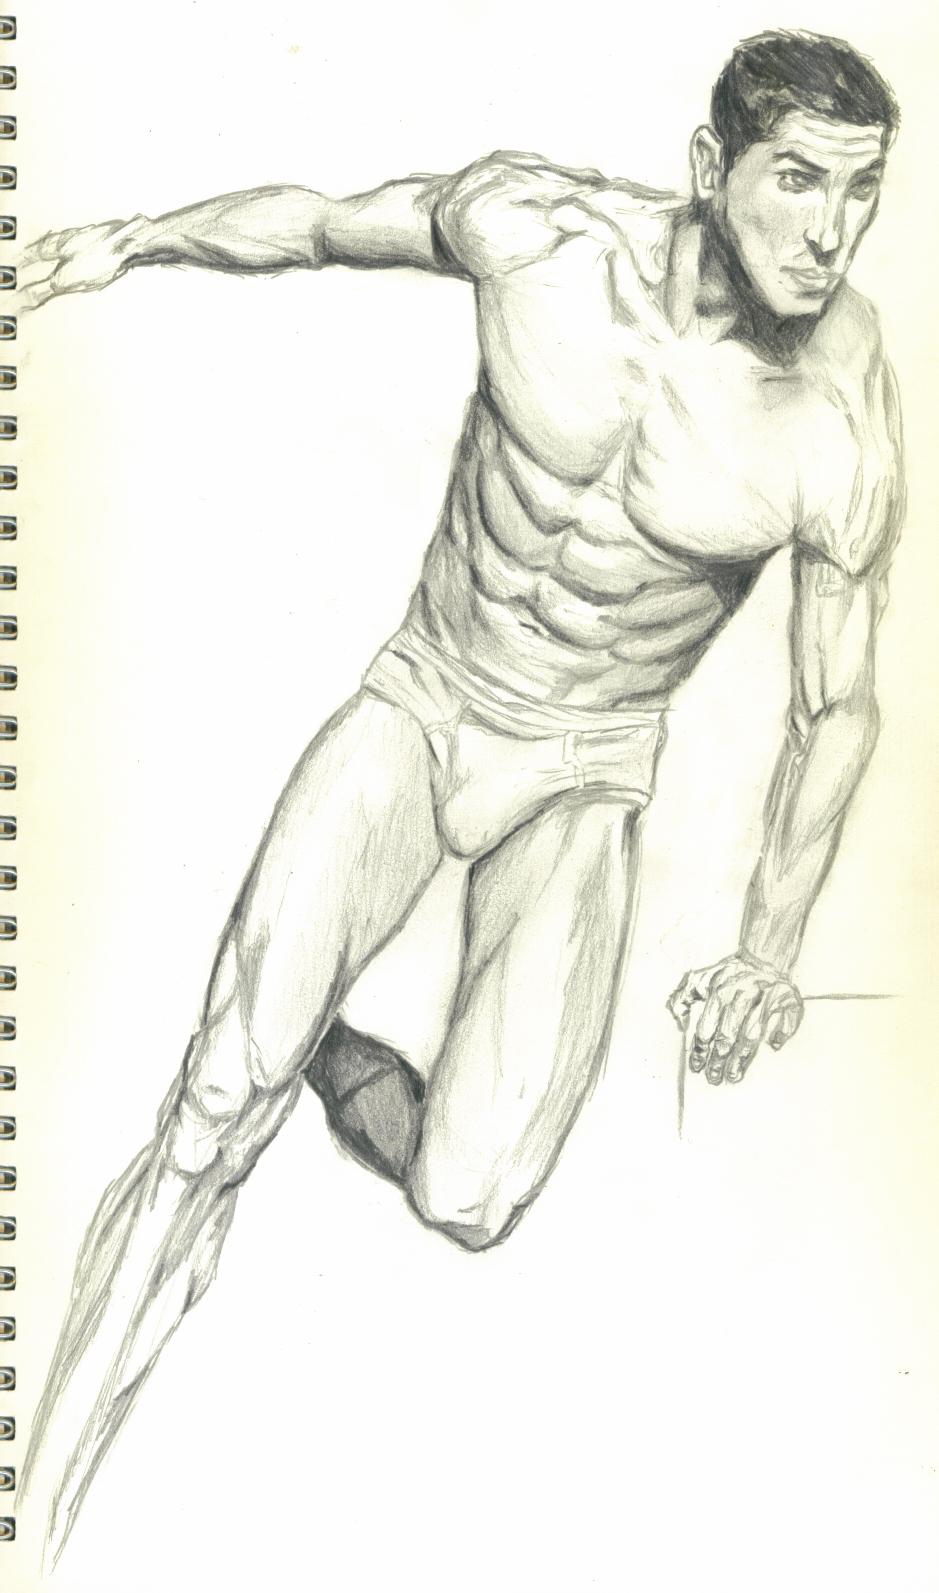 Underwear Model Dude